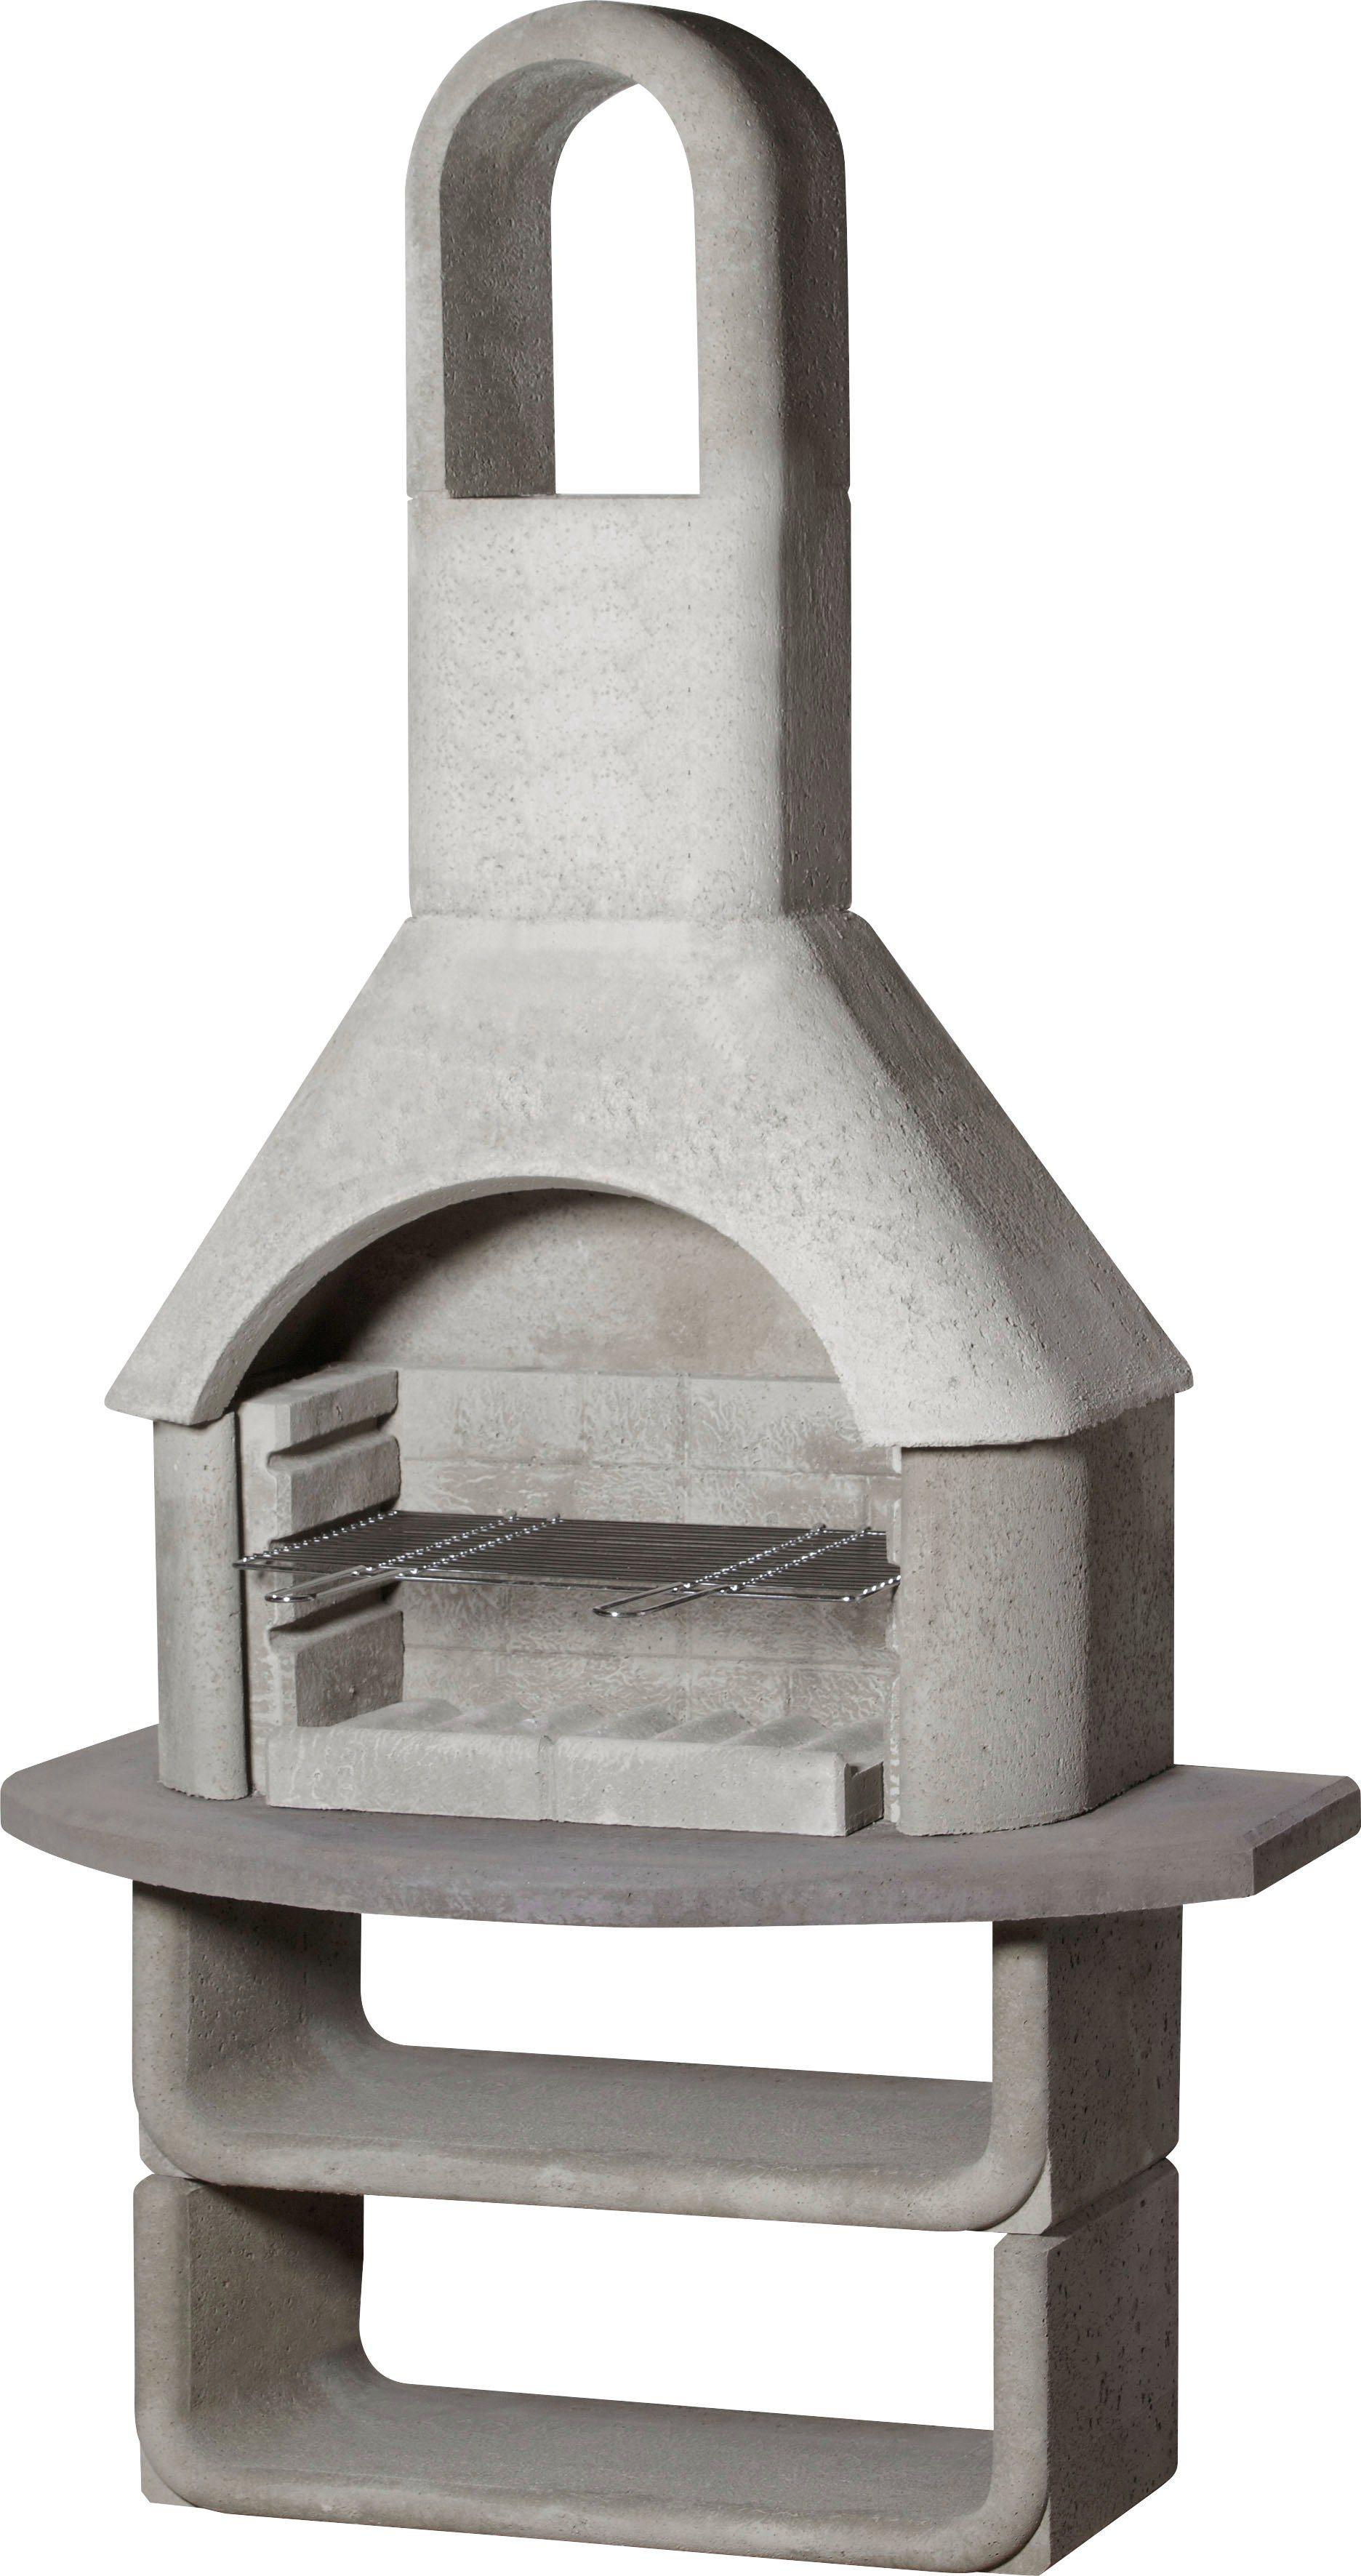 Grillkamin »Capri«, B/T/H: 110/65/206 cm